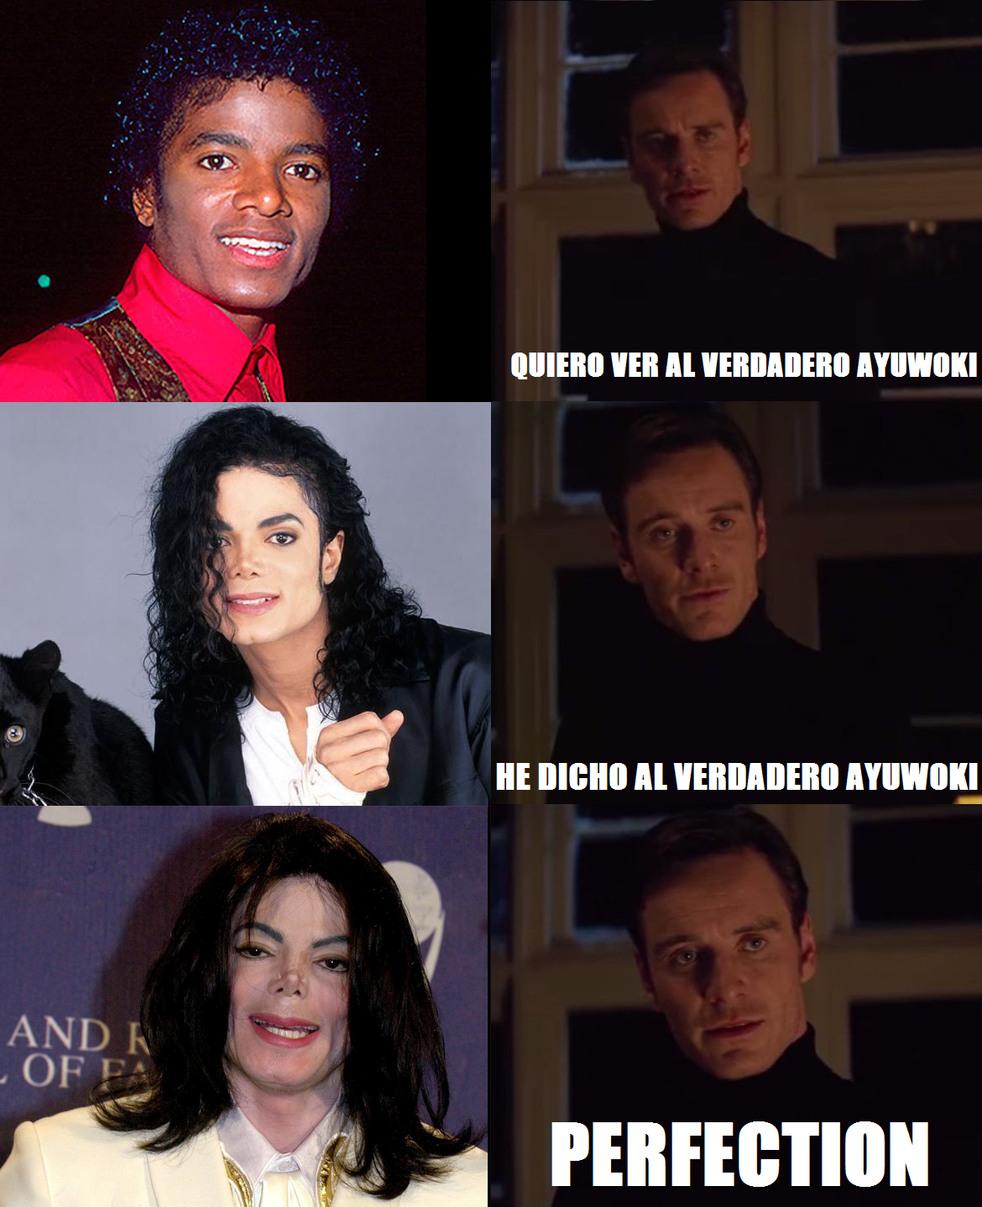 El Ayuwoki - meme